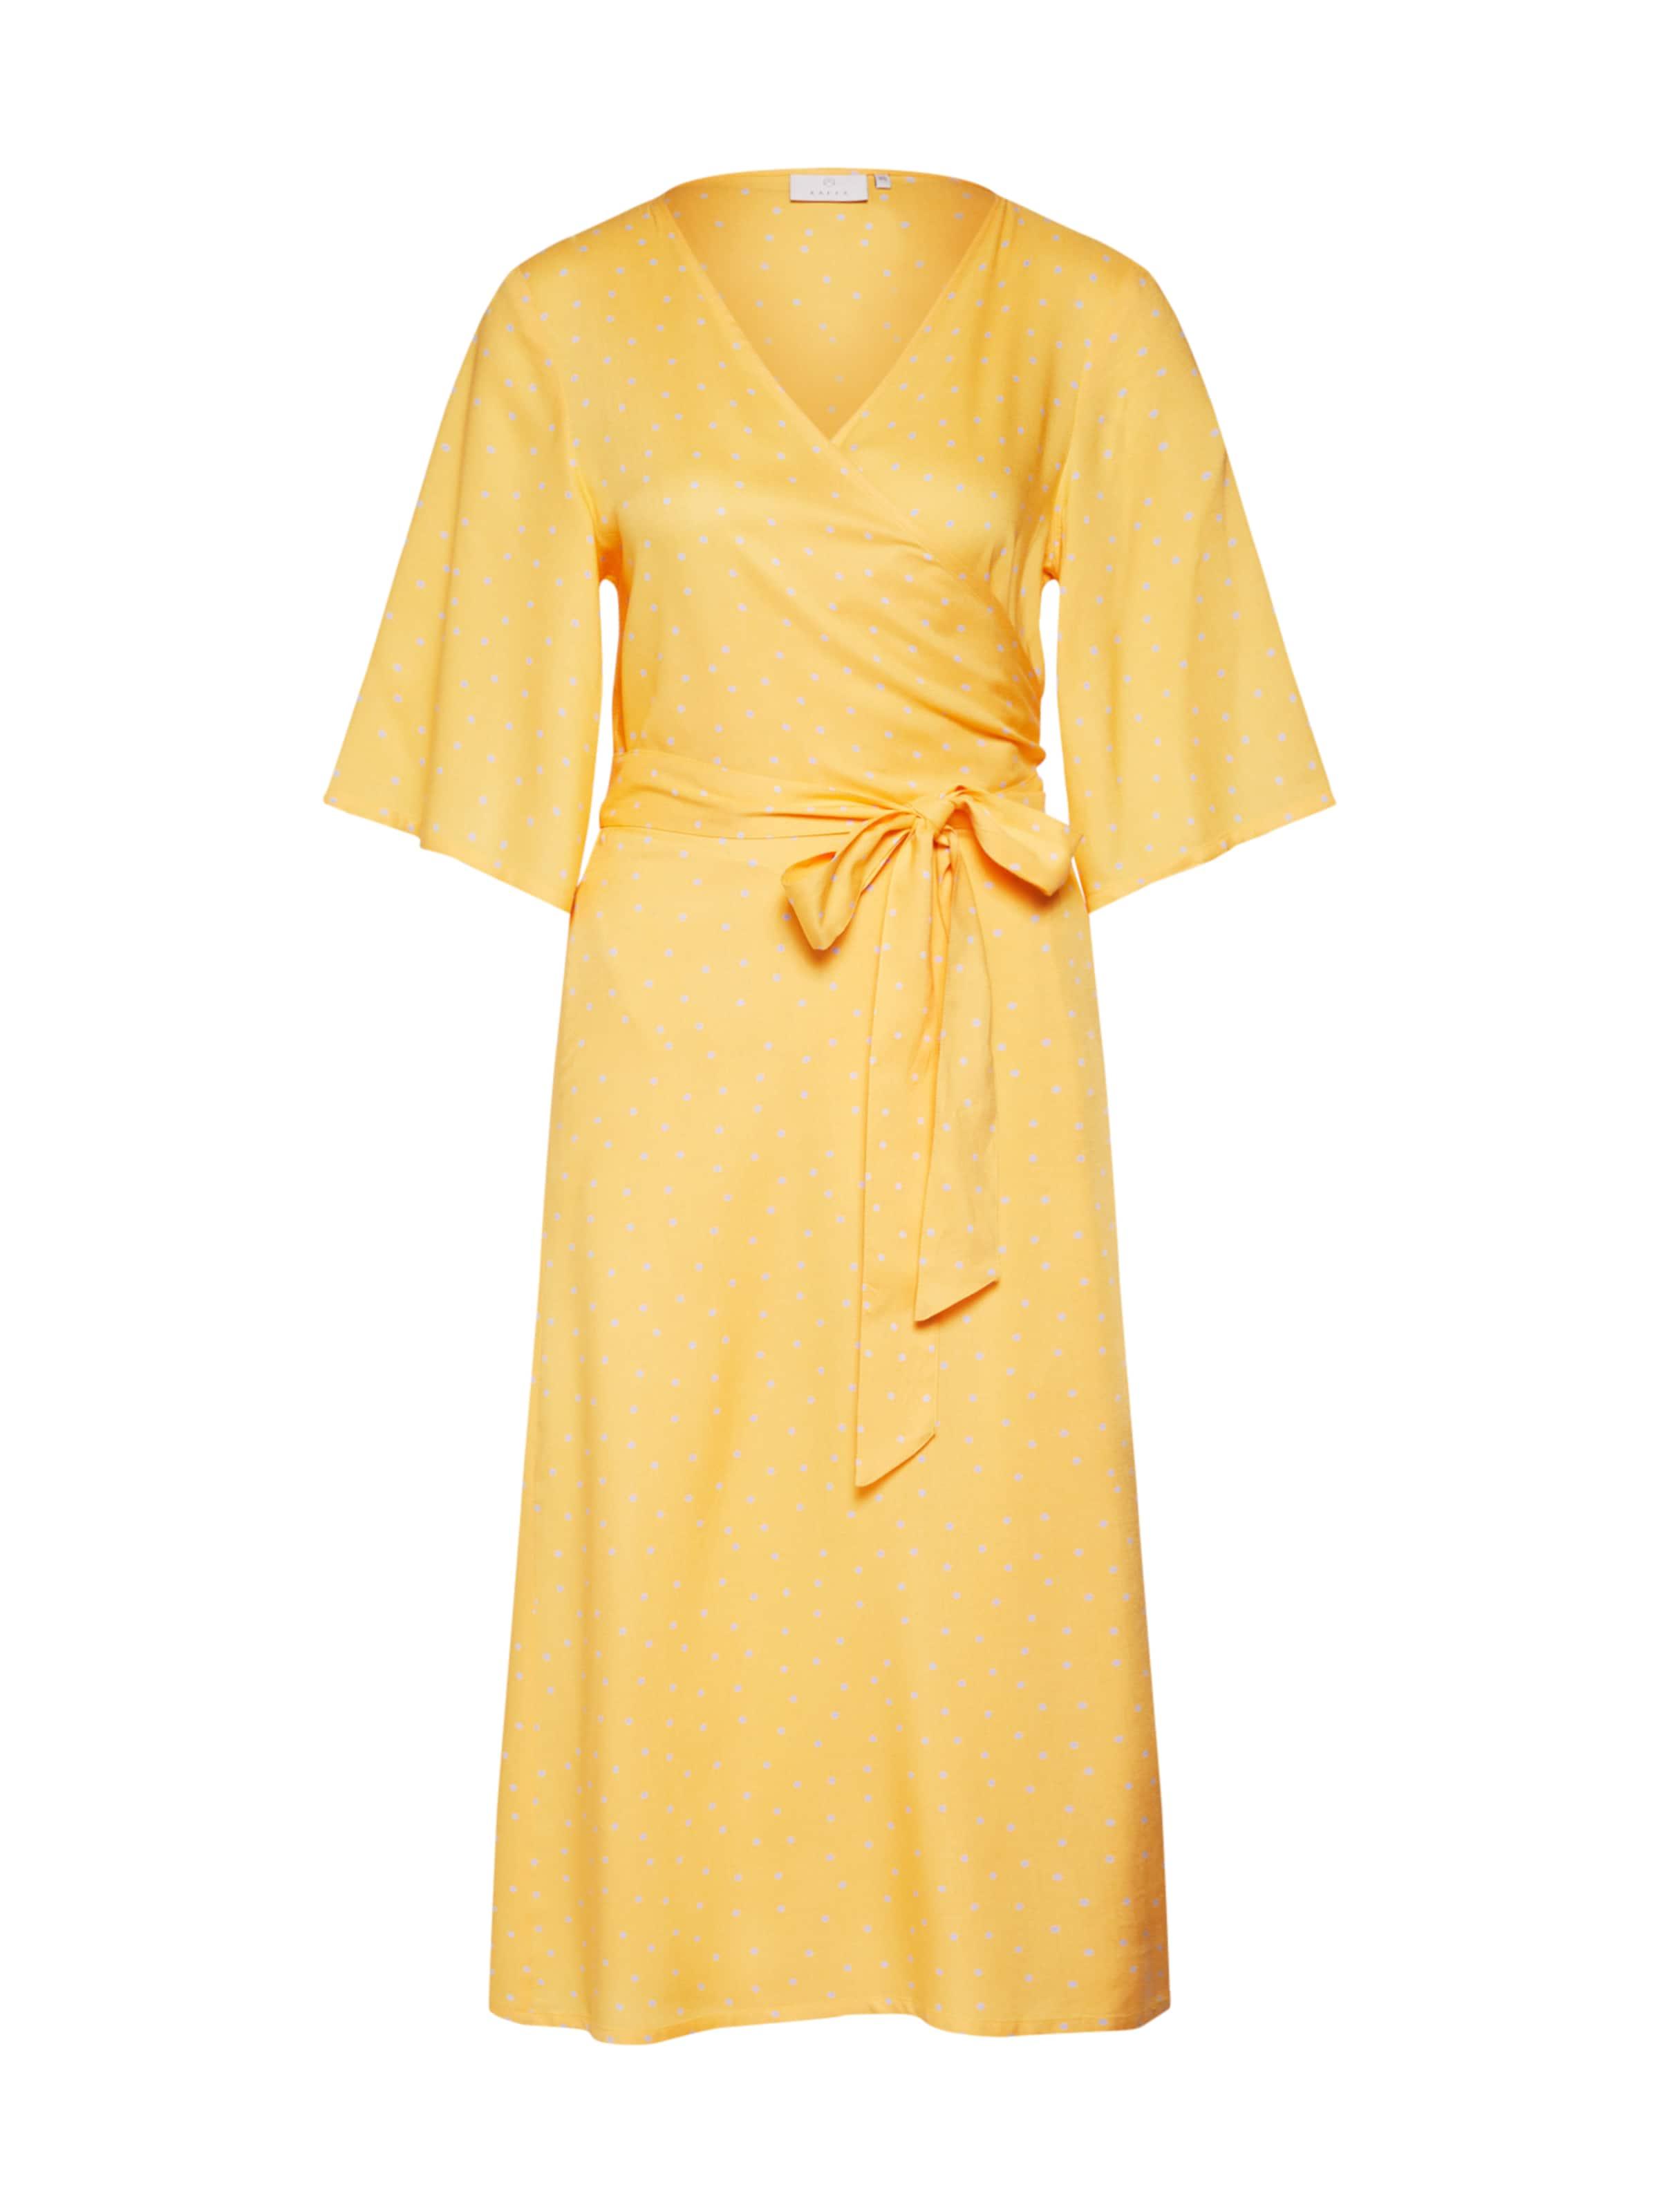 'isabel' Kaffe In Kaffe In 'isabel' GelbSilber Kleid Kleid L3A4Rq5j